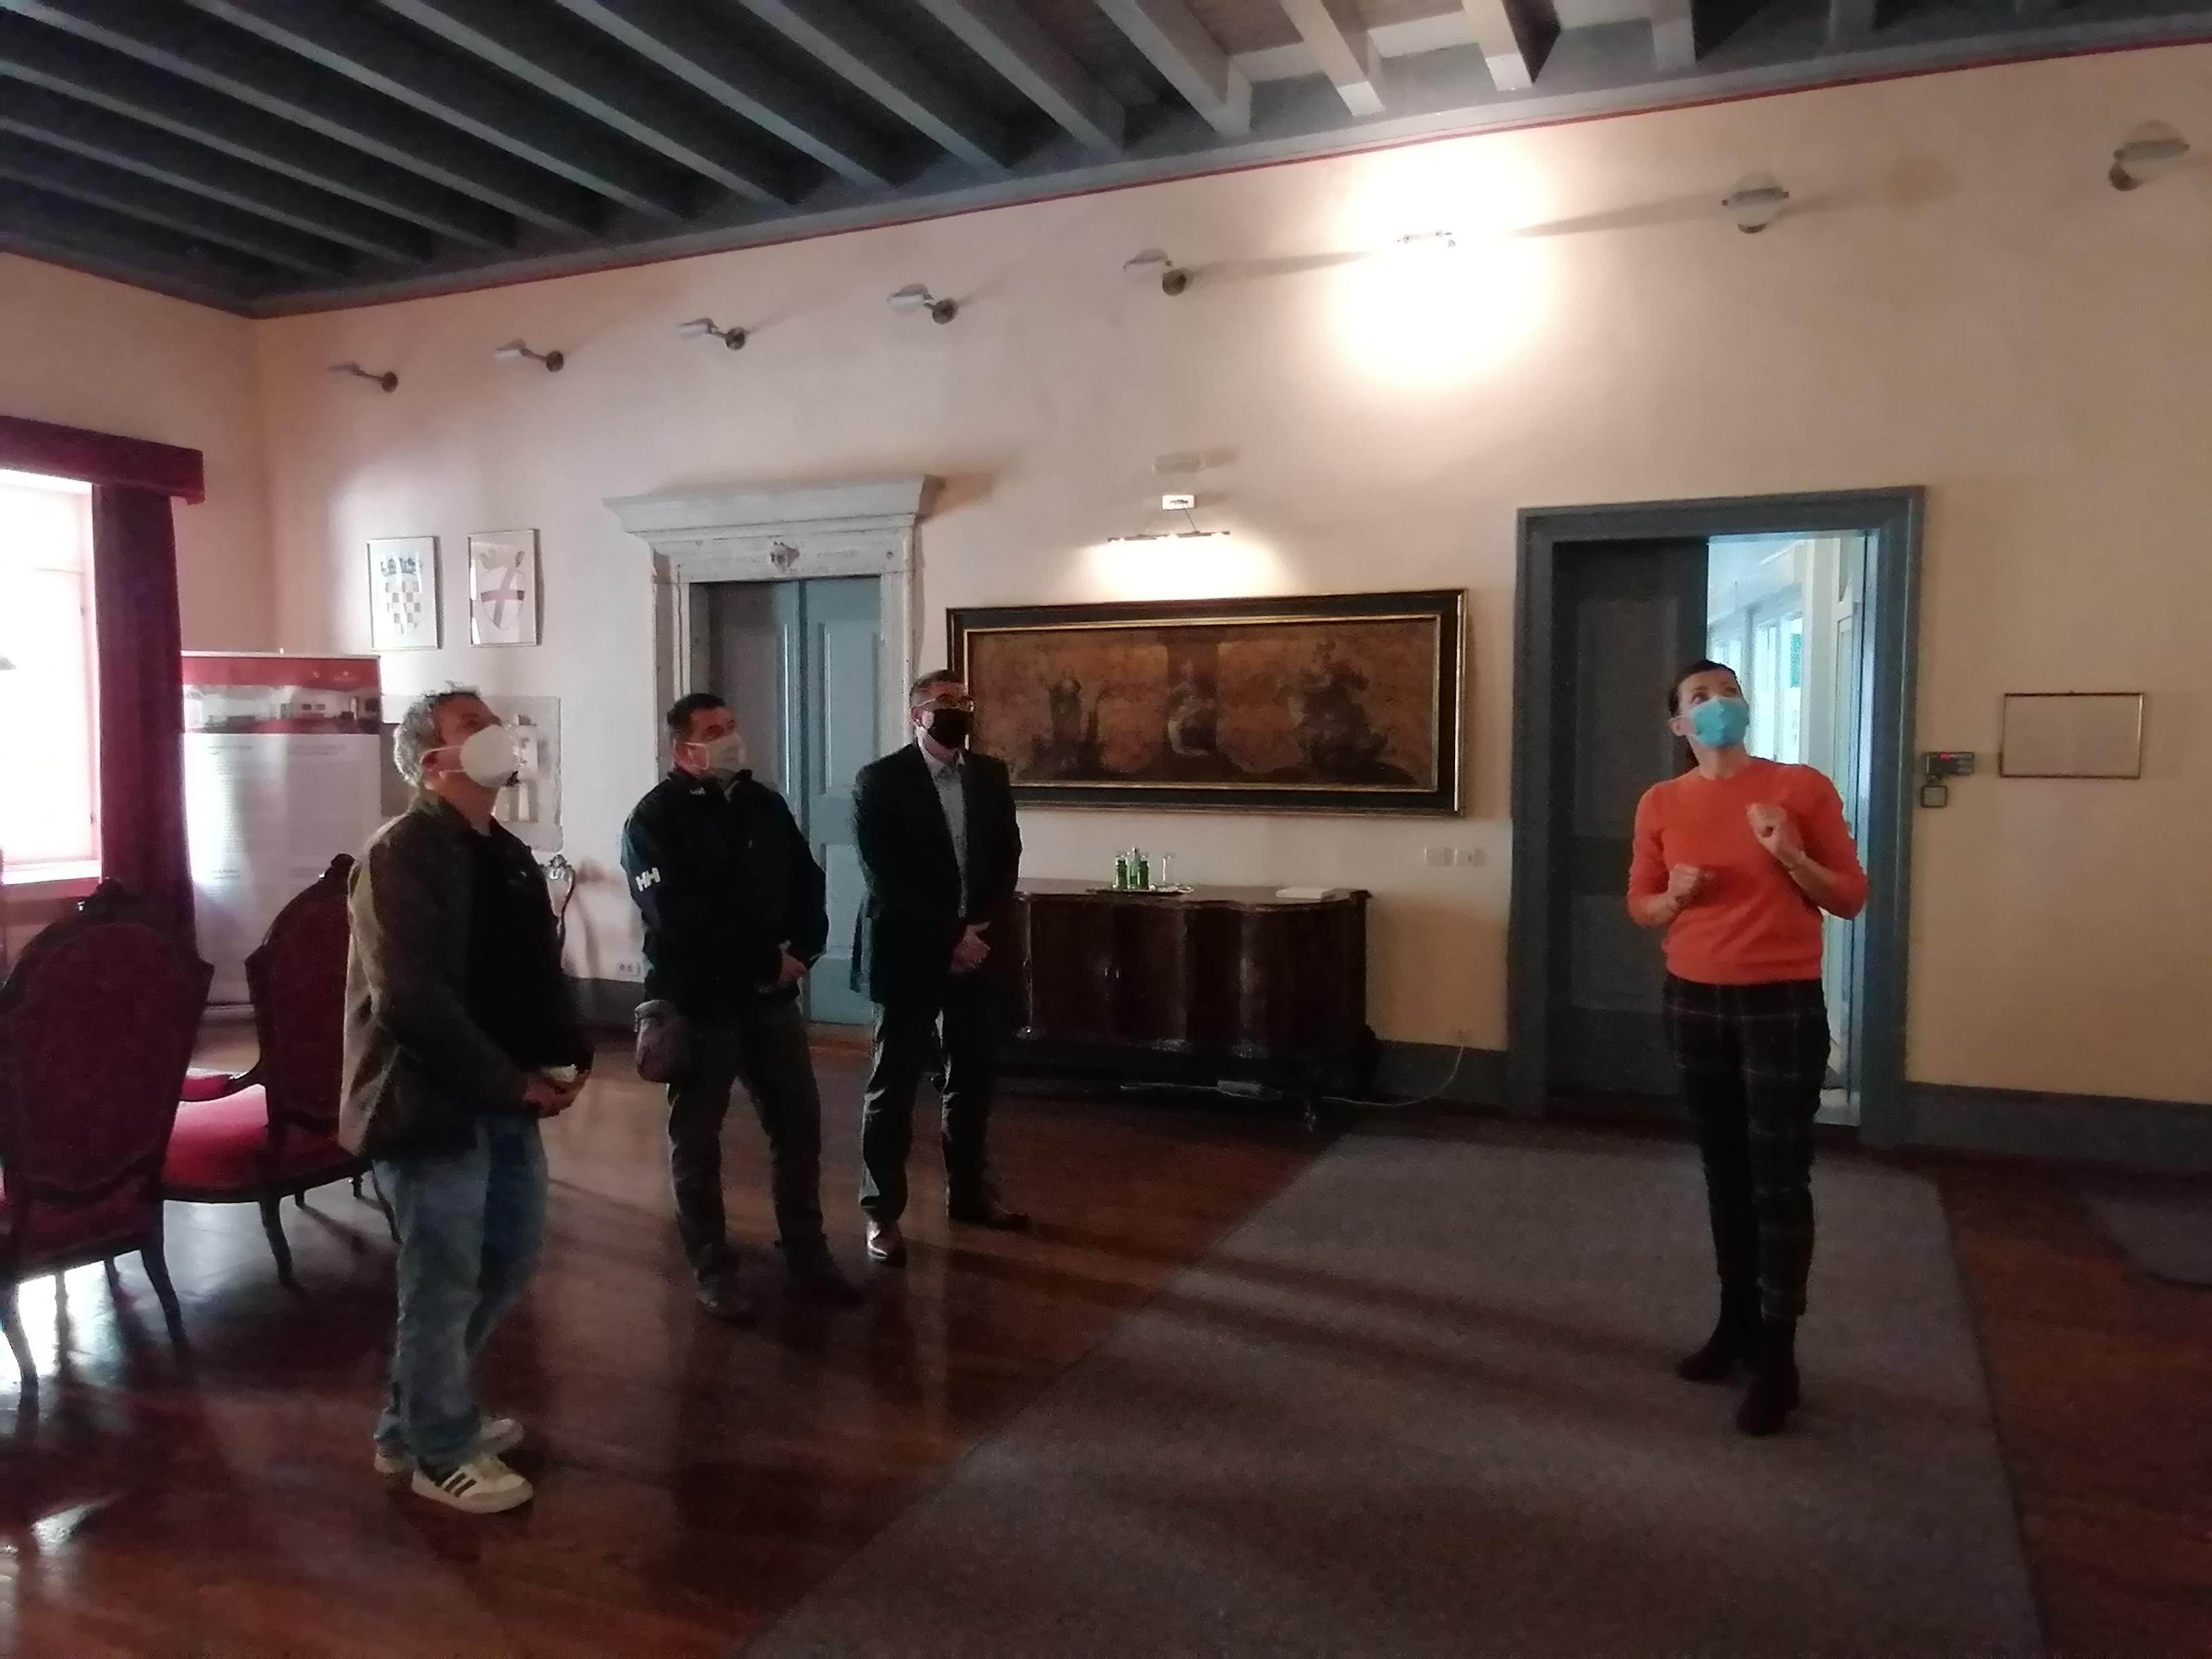 Il sindaco ha augurato il benvenuto all'artista salisburghese Peter Bauneis